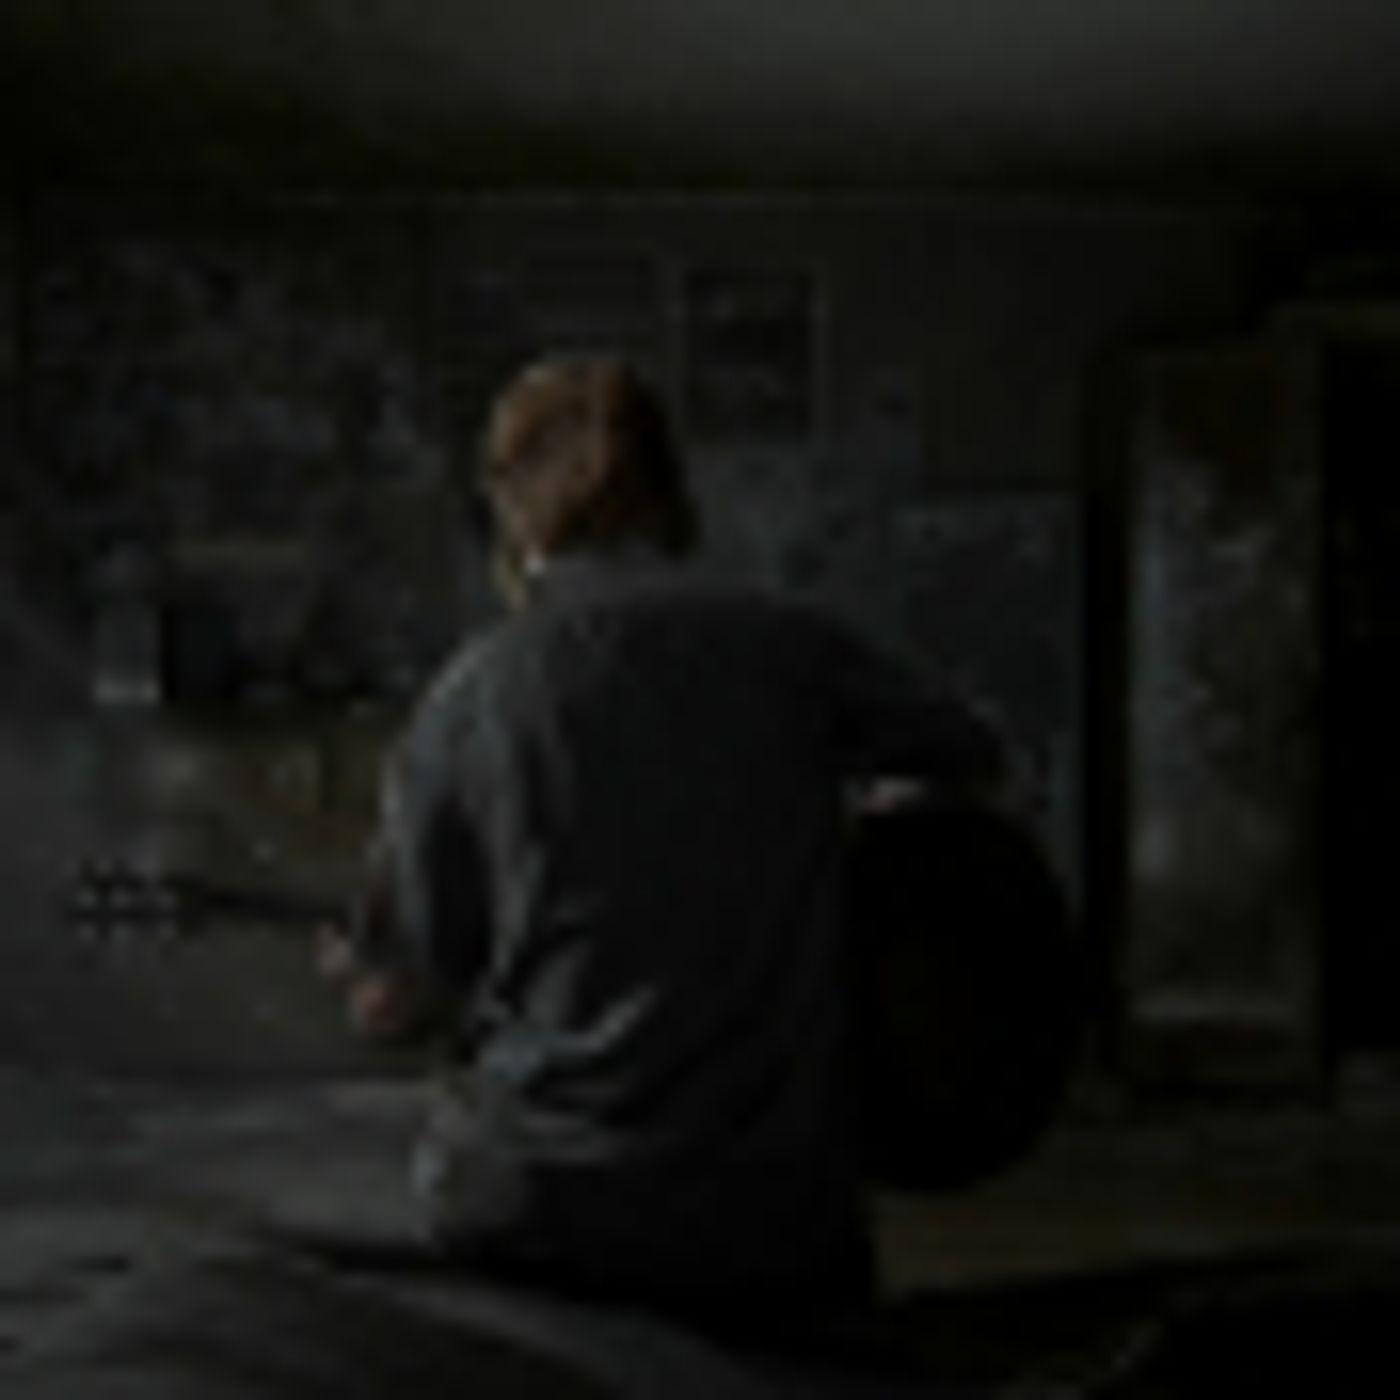 Episode 91: Last of Us Part II Review